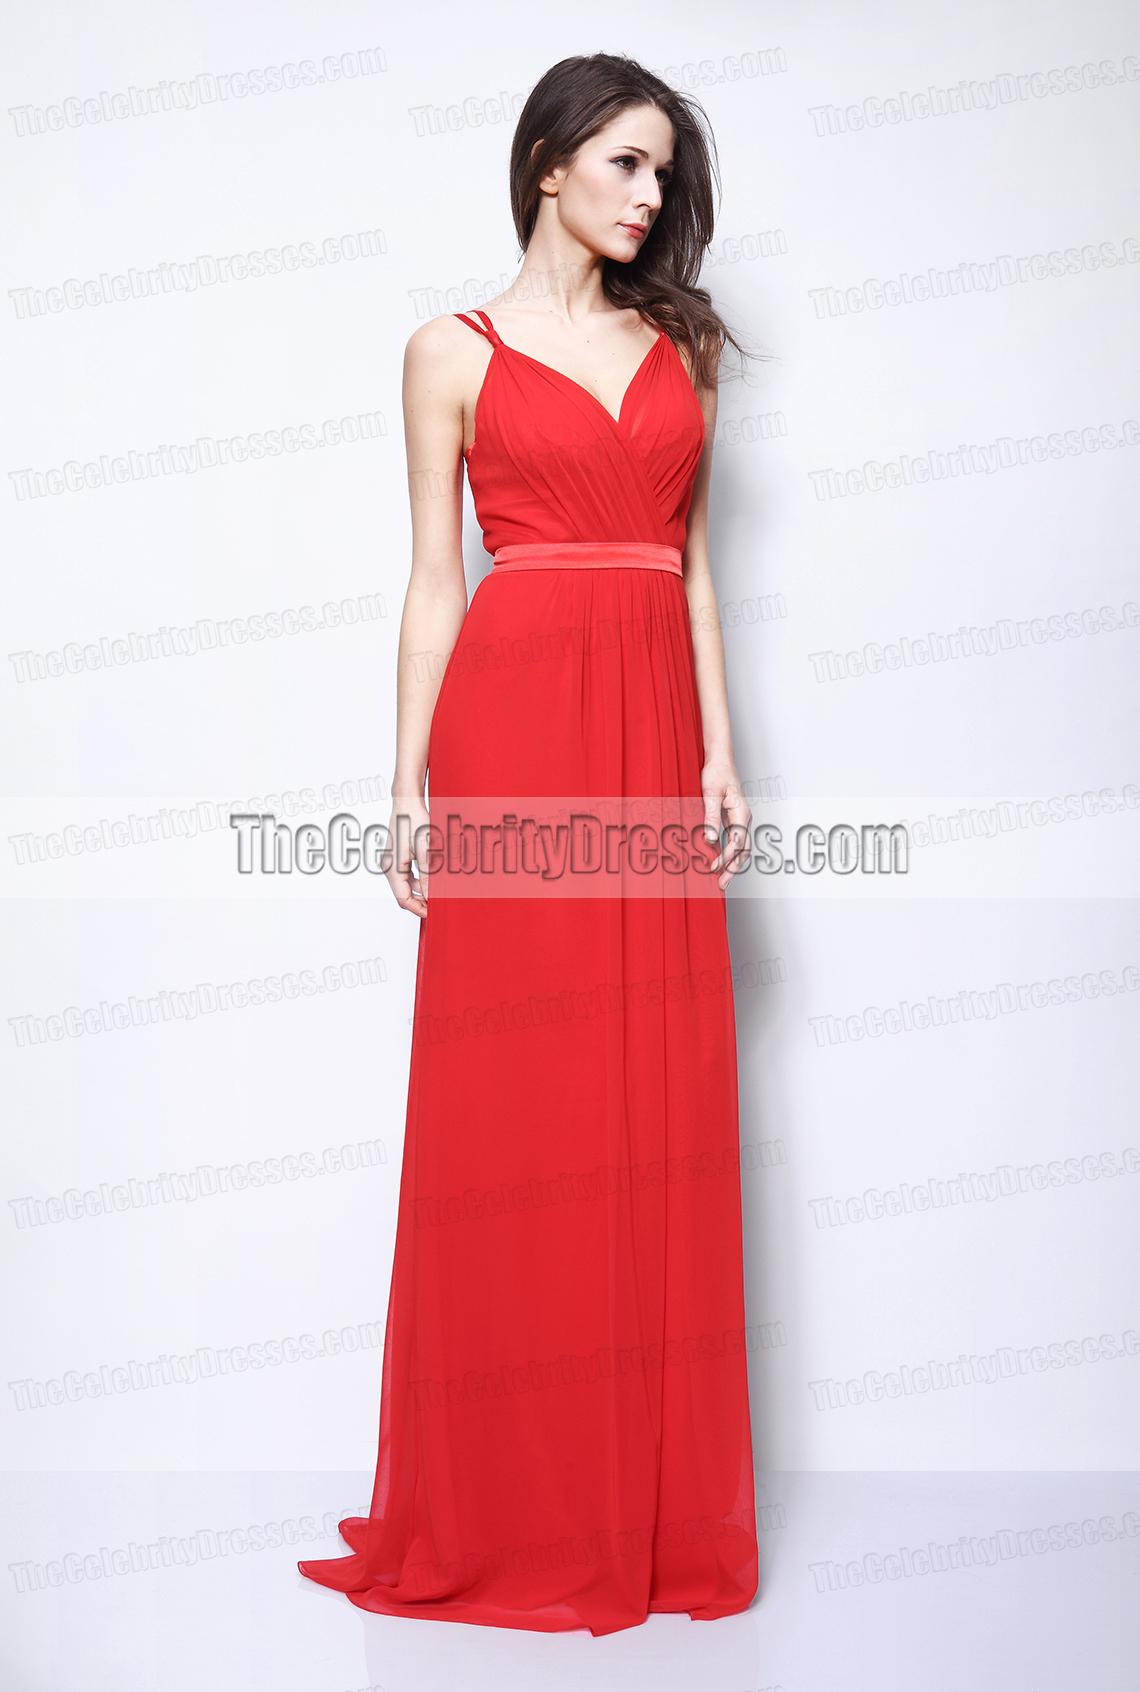 Selena Gomez Red Chiffon Evening Formal Dress 2011 Oscars ...